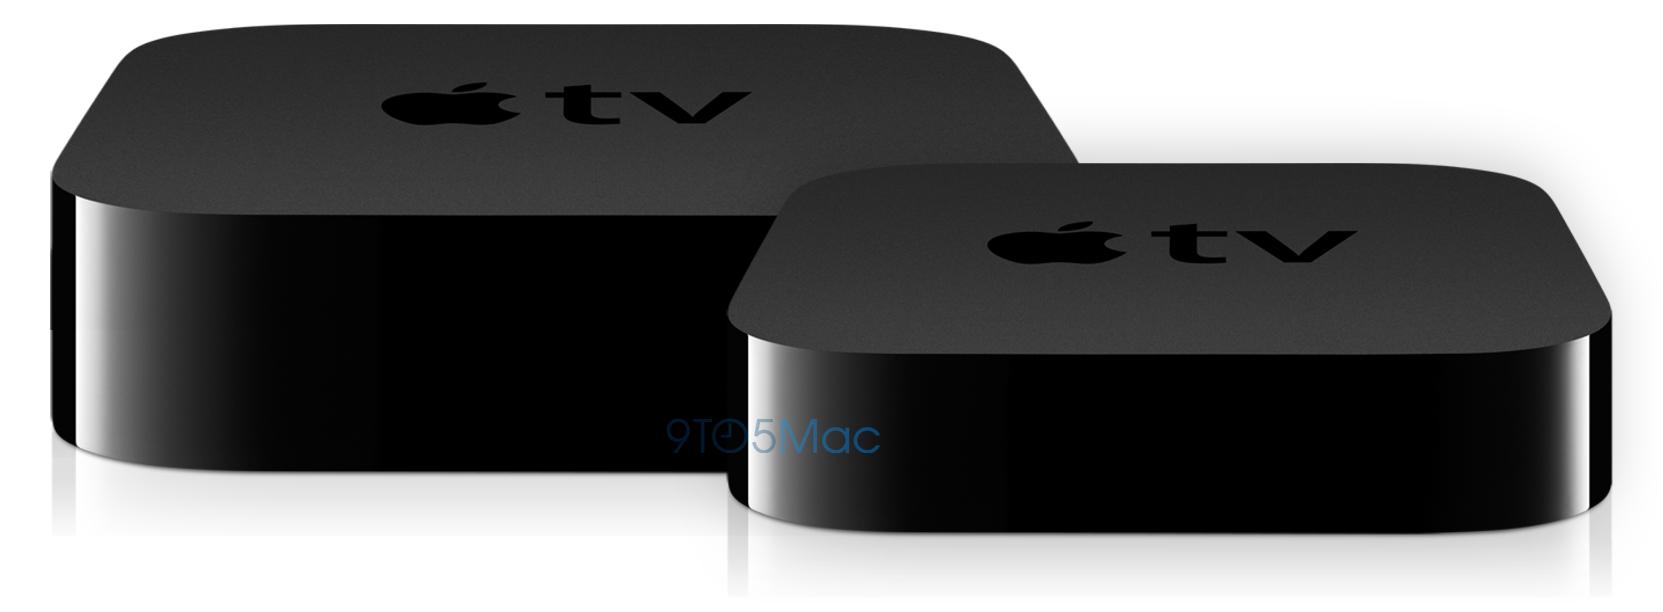 AppleTVStaggered